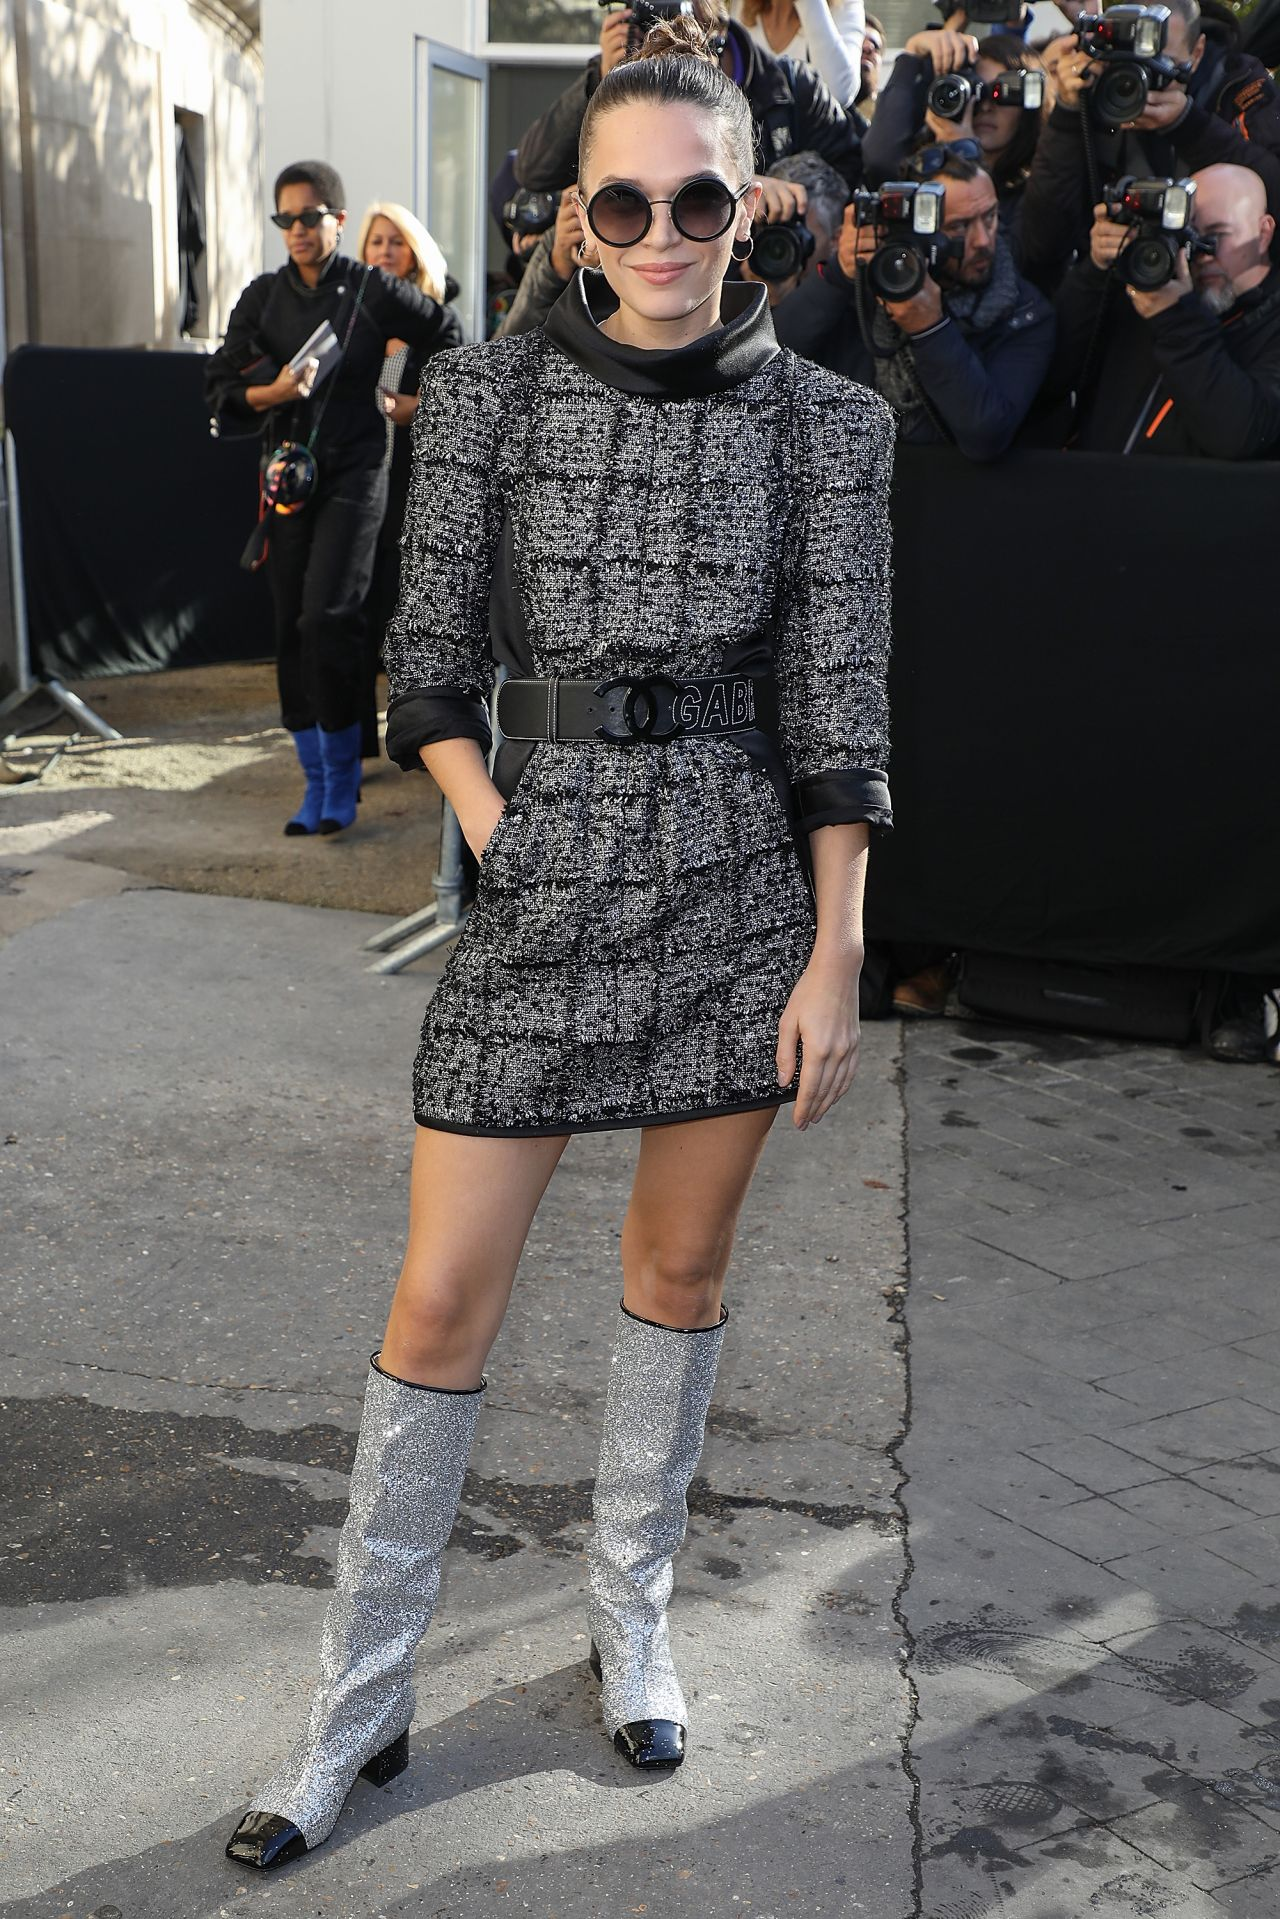 Chanel west coast legs XXX tube Pia Muehlenbeck Nude Photos and Videos,Bikini Photos of Ava Sambora. 2018-2019 celebrityes photos leaks!